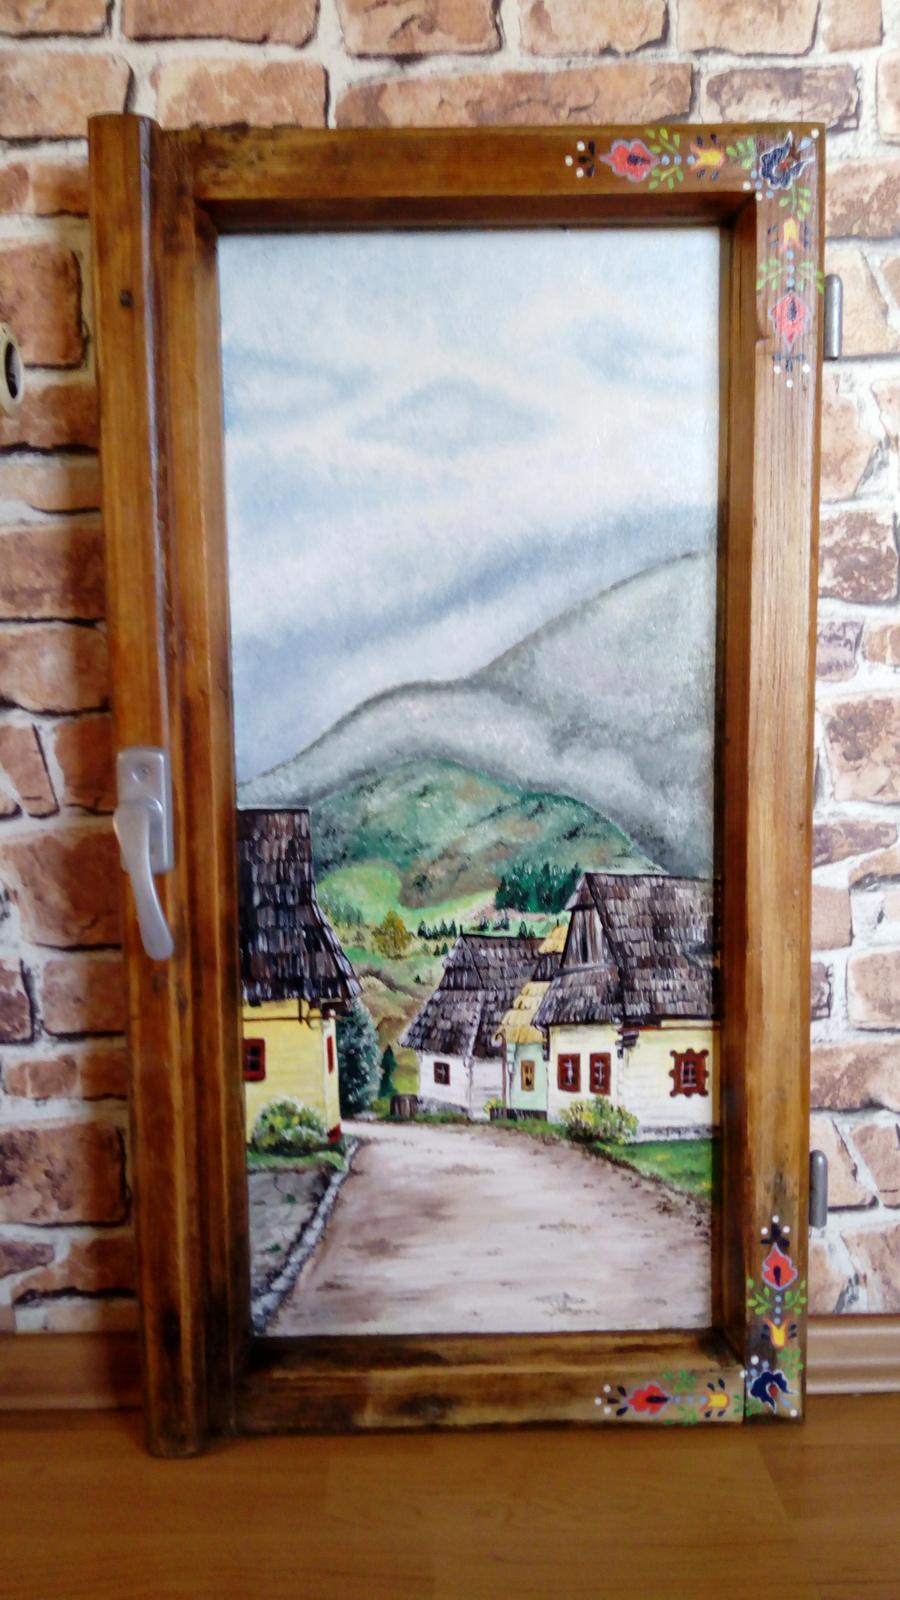 Obraz v starom okennom ráme Vlkolínec - Obrázok č. 1